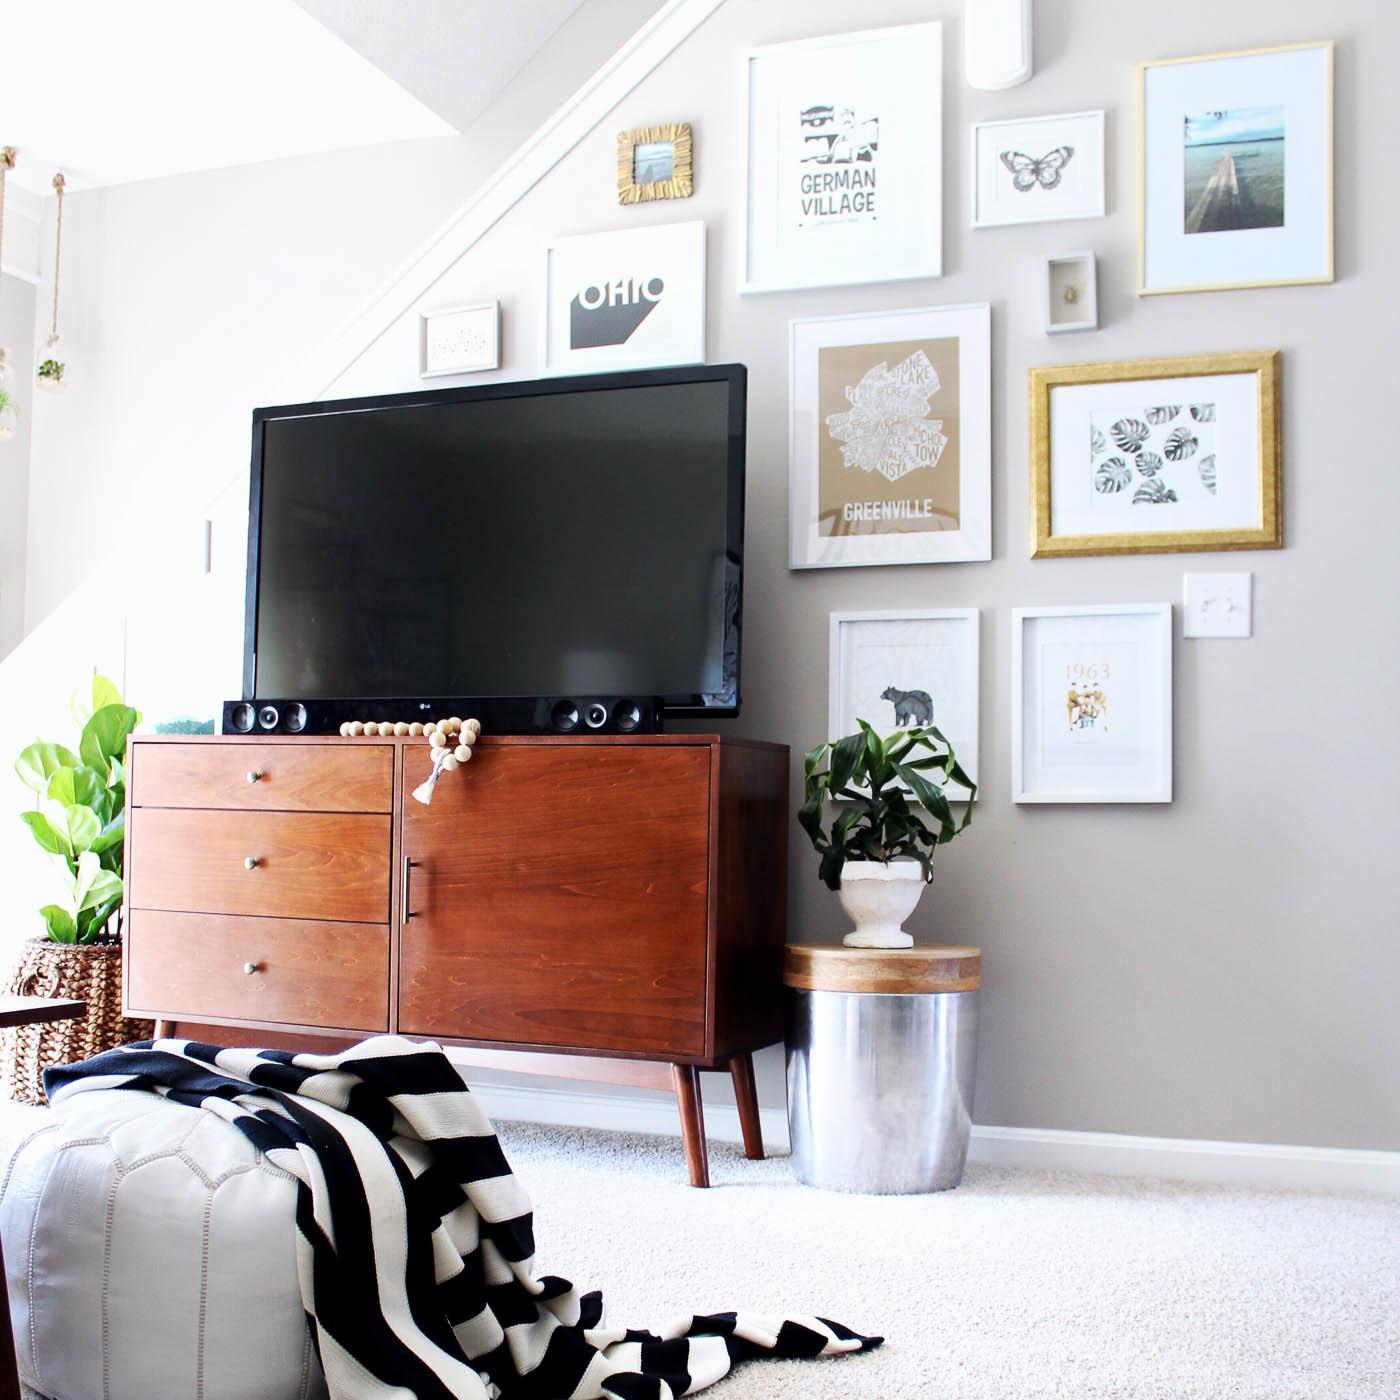 cozy-quarters-ohio-natural-light-photography-studio-lifestyle-photographer-19.jpg